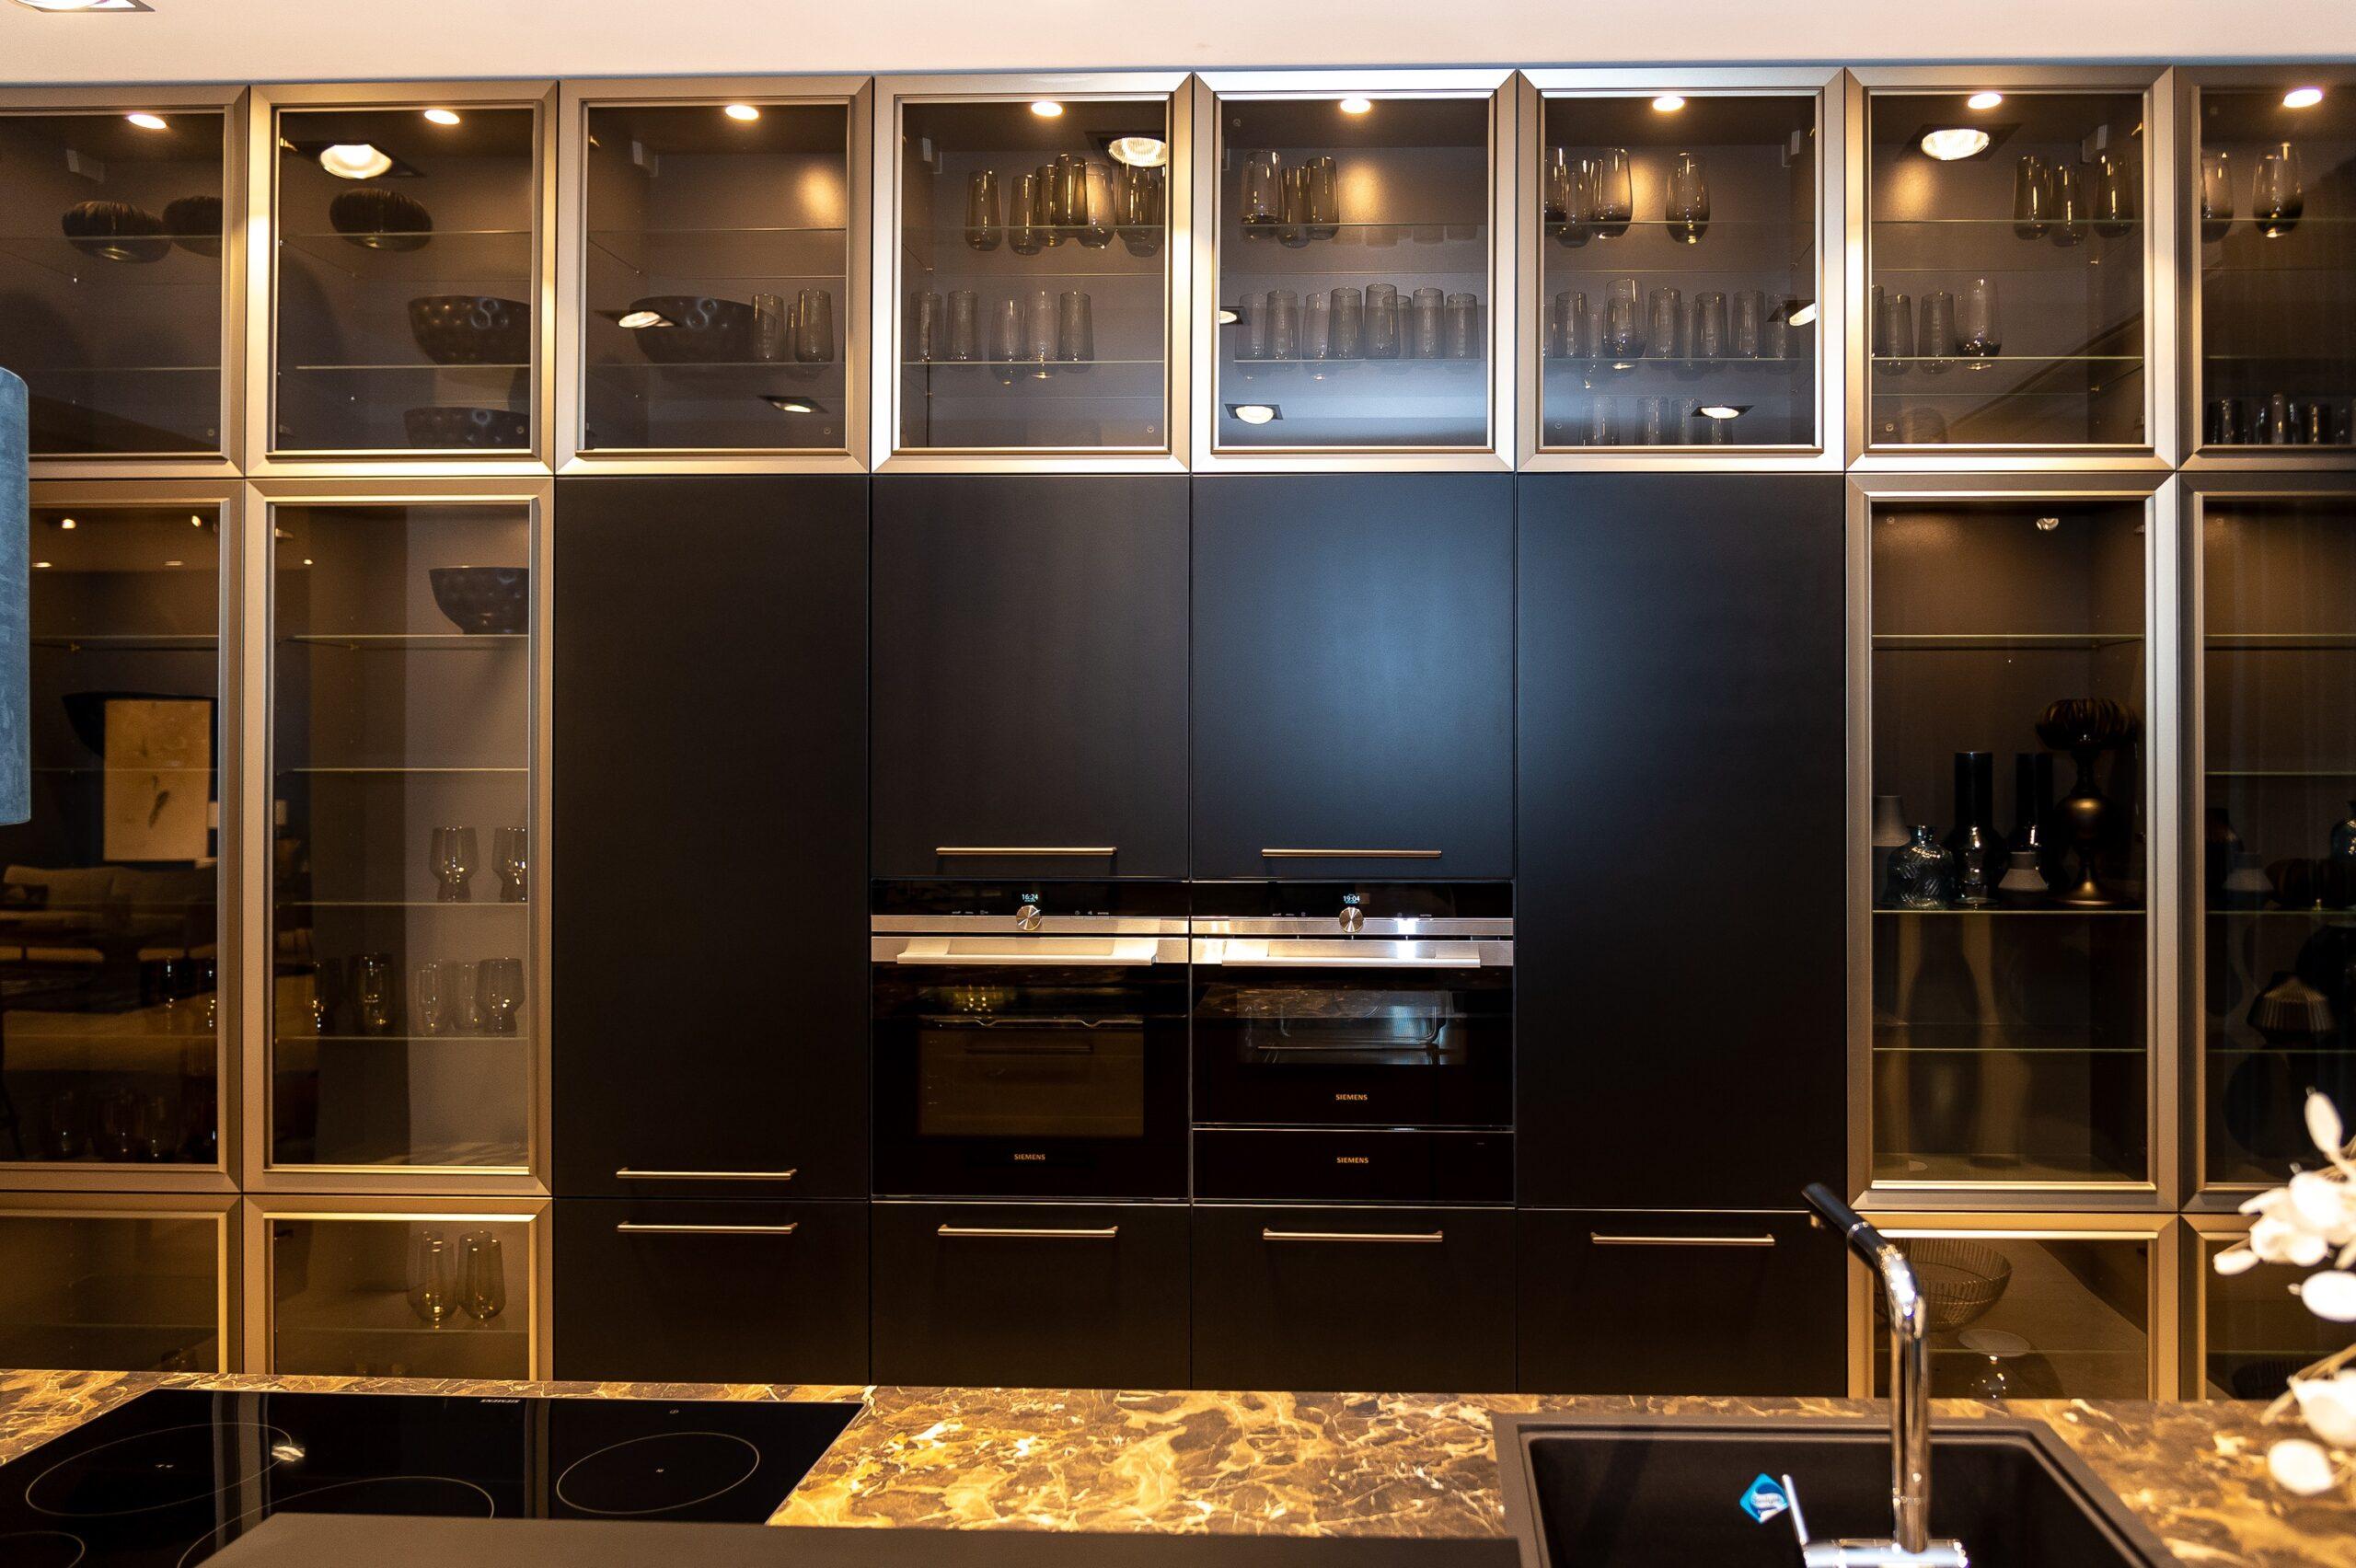 Full Size of Häcker Müllsystem Küche Wohnzimmer Häcker Müllsystem